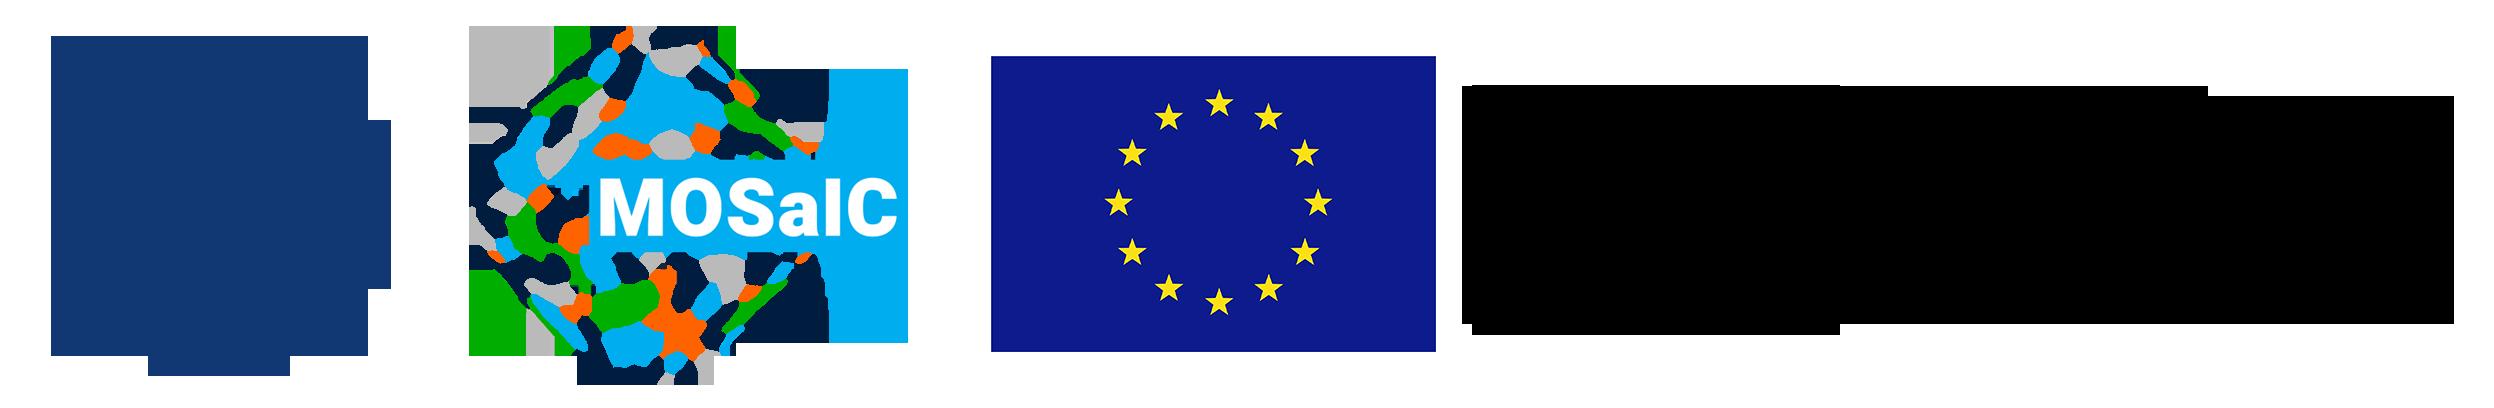 loga: Instytutu, projektu MOSaIC i UE + informacja o finansowaniu projektu